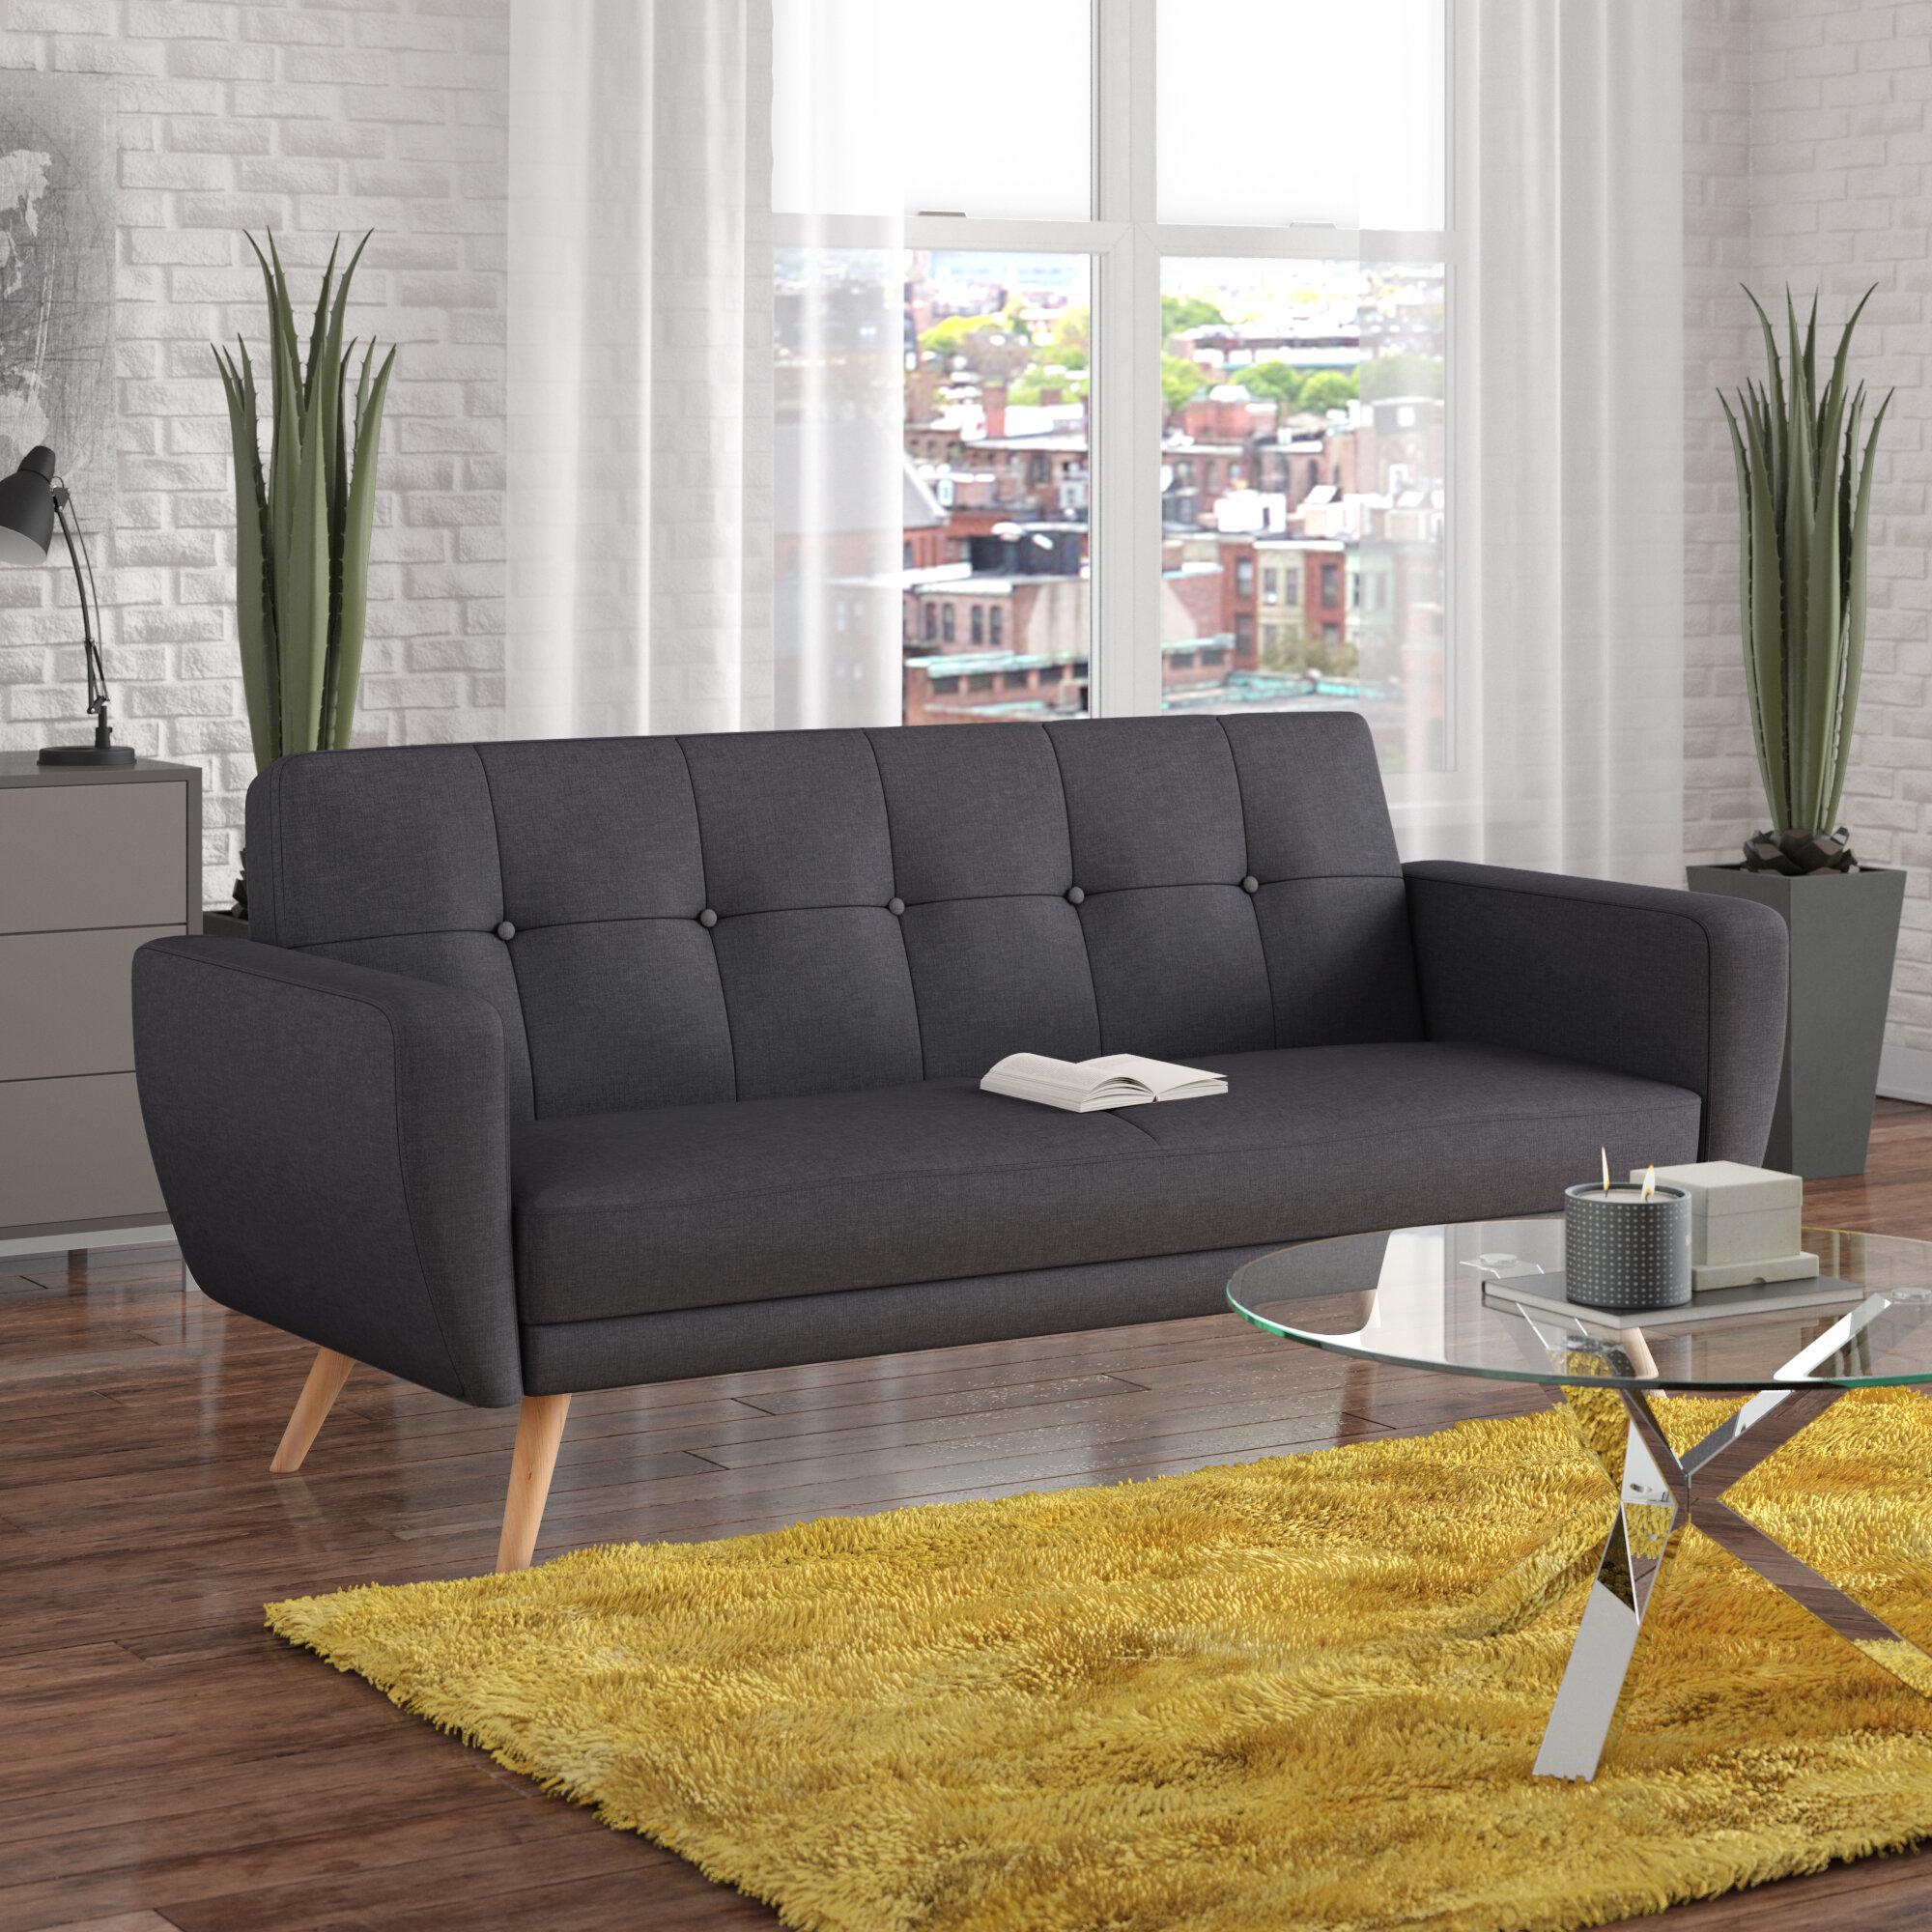 Phenomenal Agneta 3 Seater Clic Clac Sofa Bed Home Interior And Landscaping Ologienasavecom